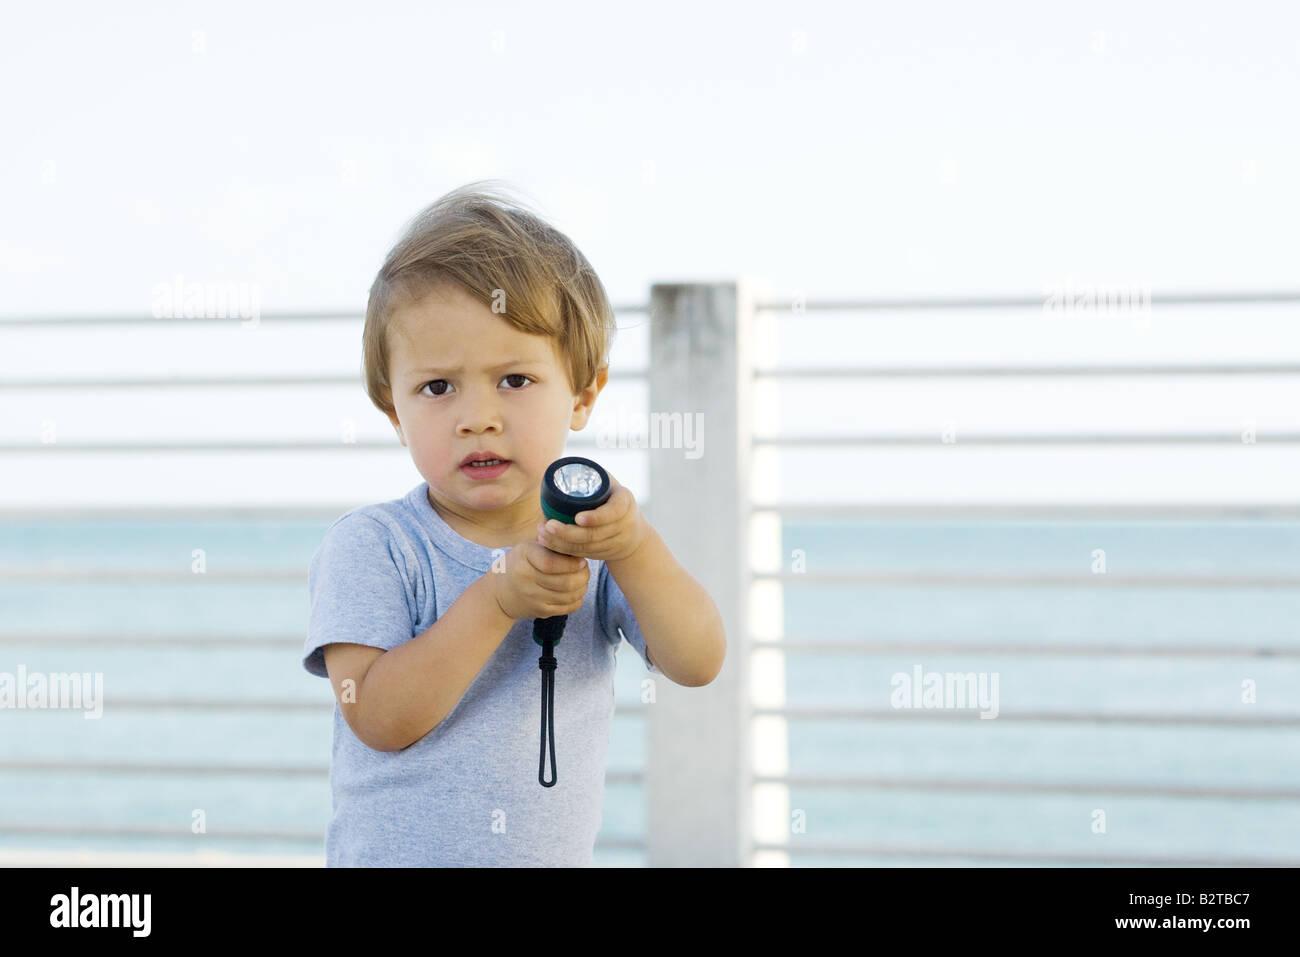 Little boy holding flashlight, frowning at camera - Stock Image